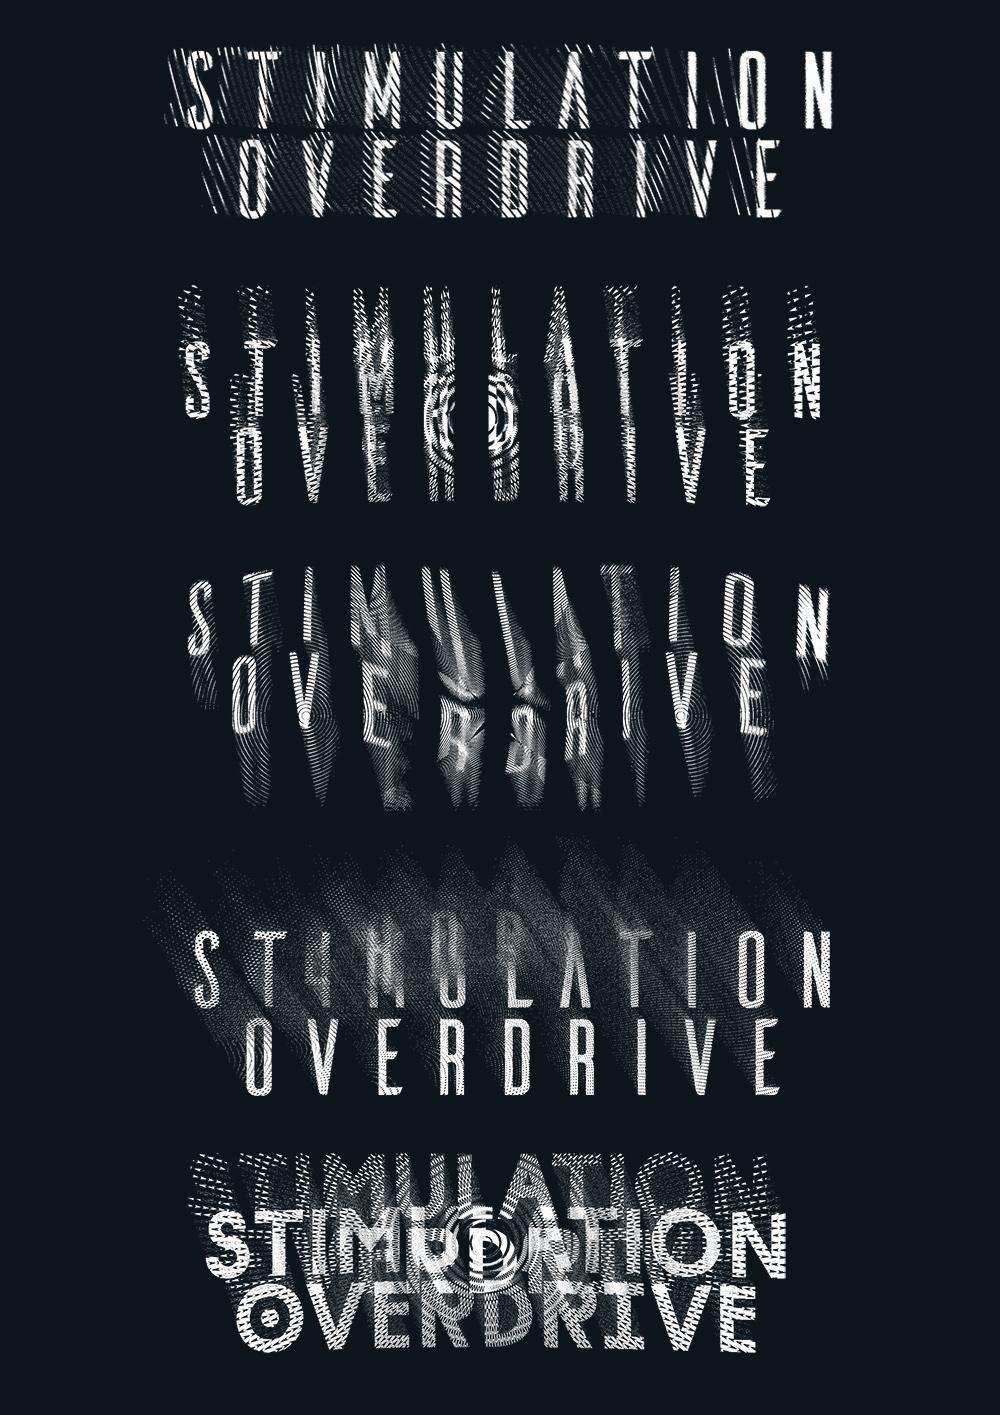 Stimulation Overdrive - image 2 - student project